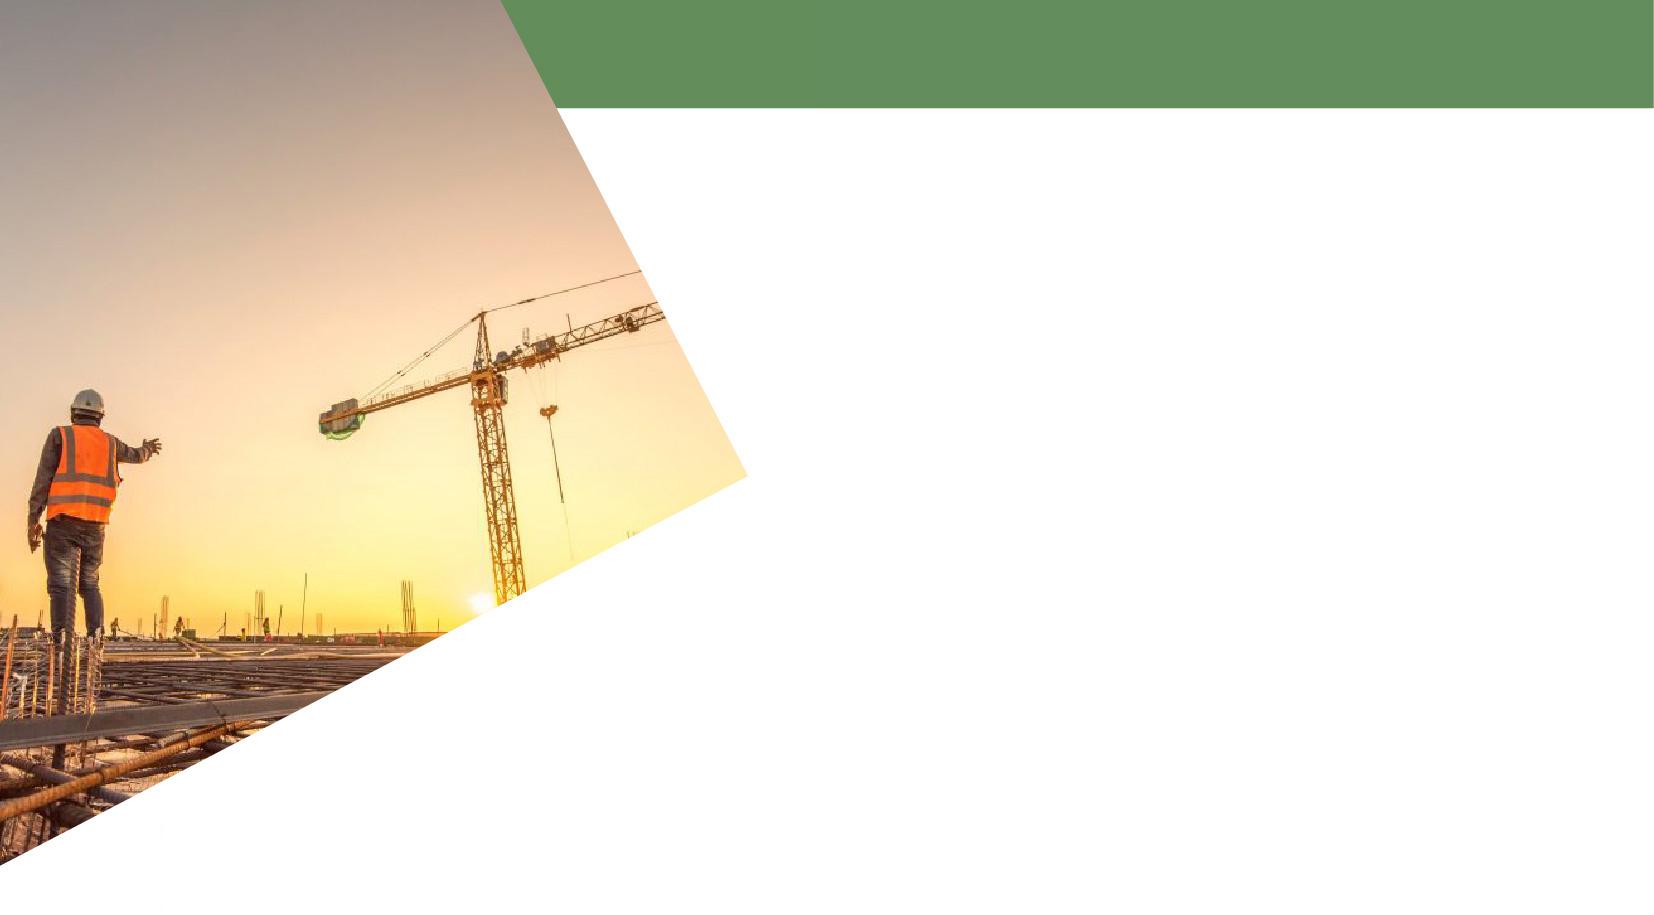 empresa constructora passivhaus con garantía